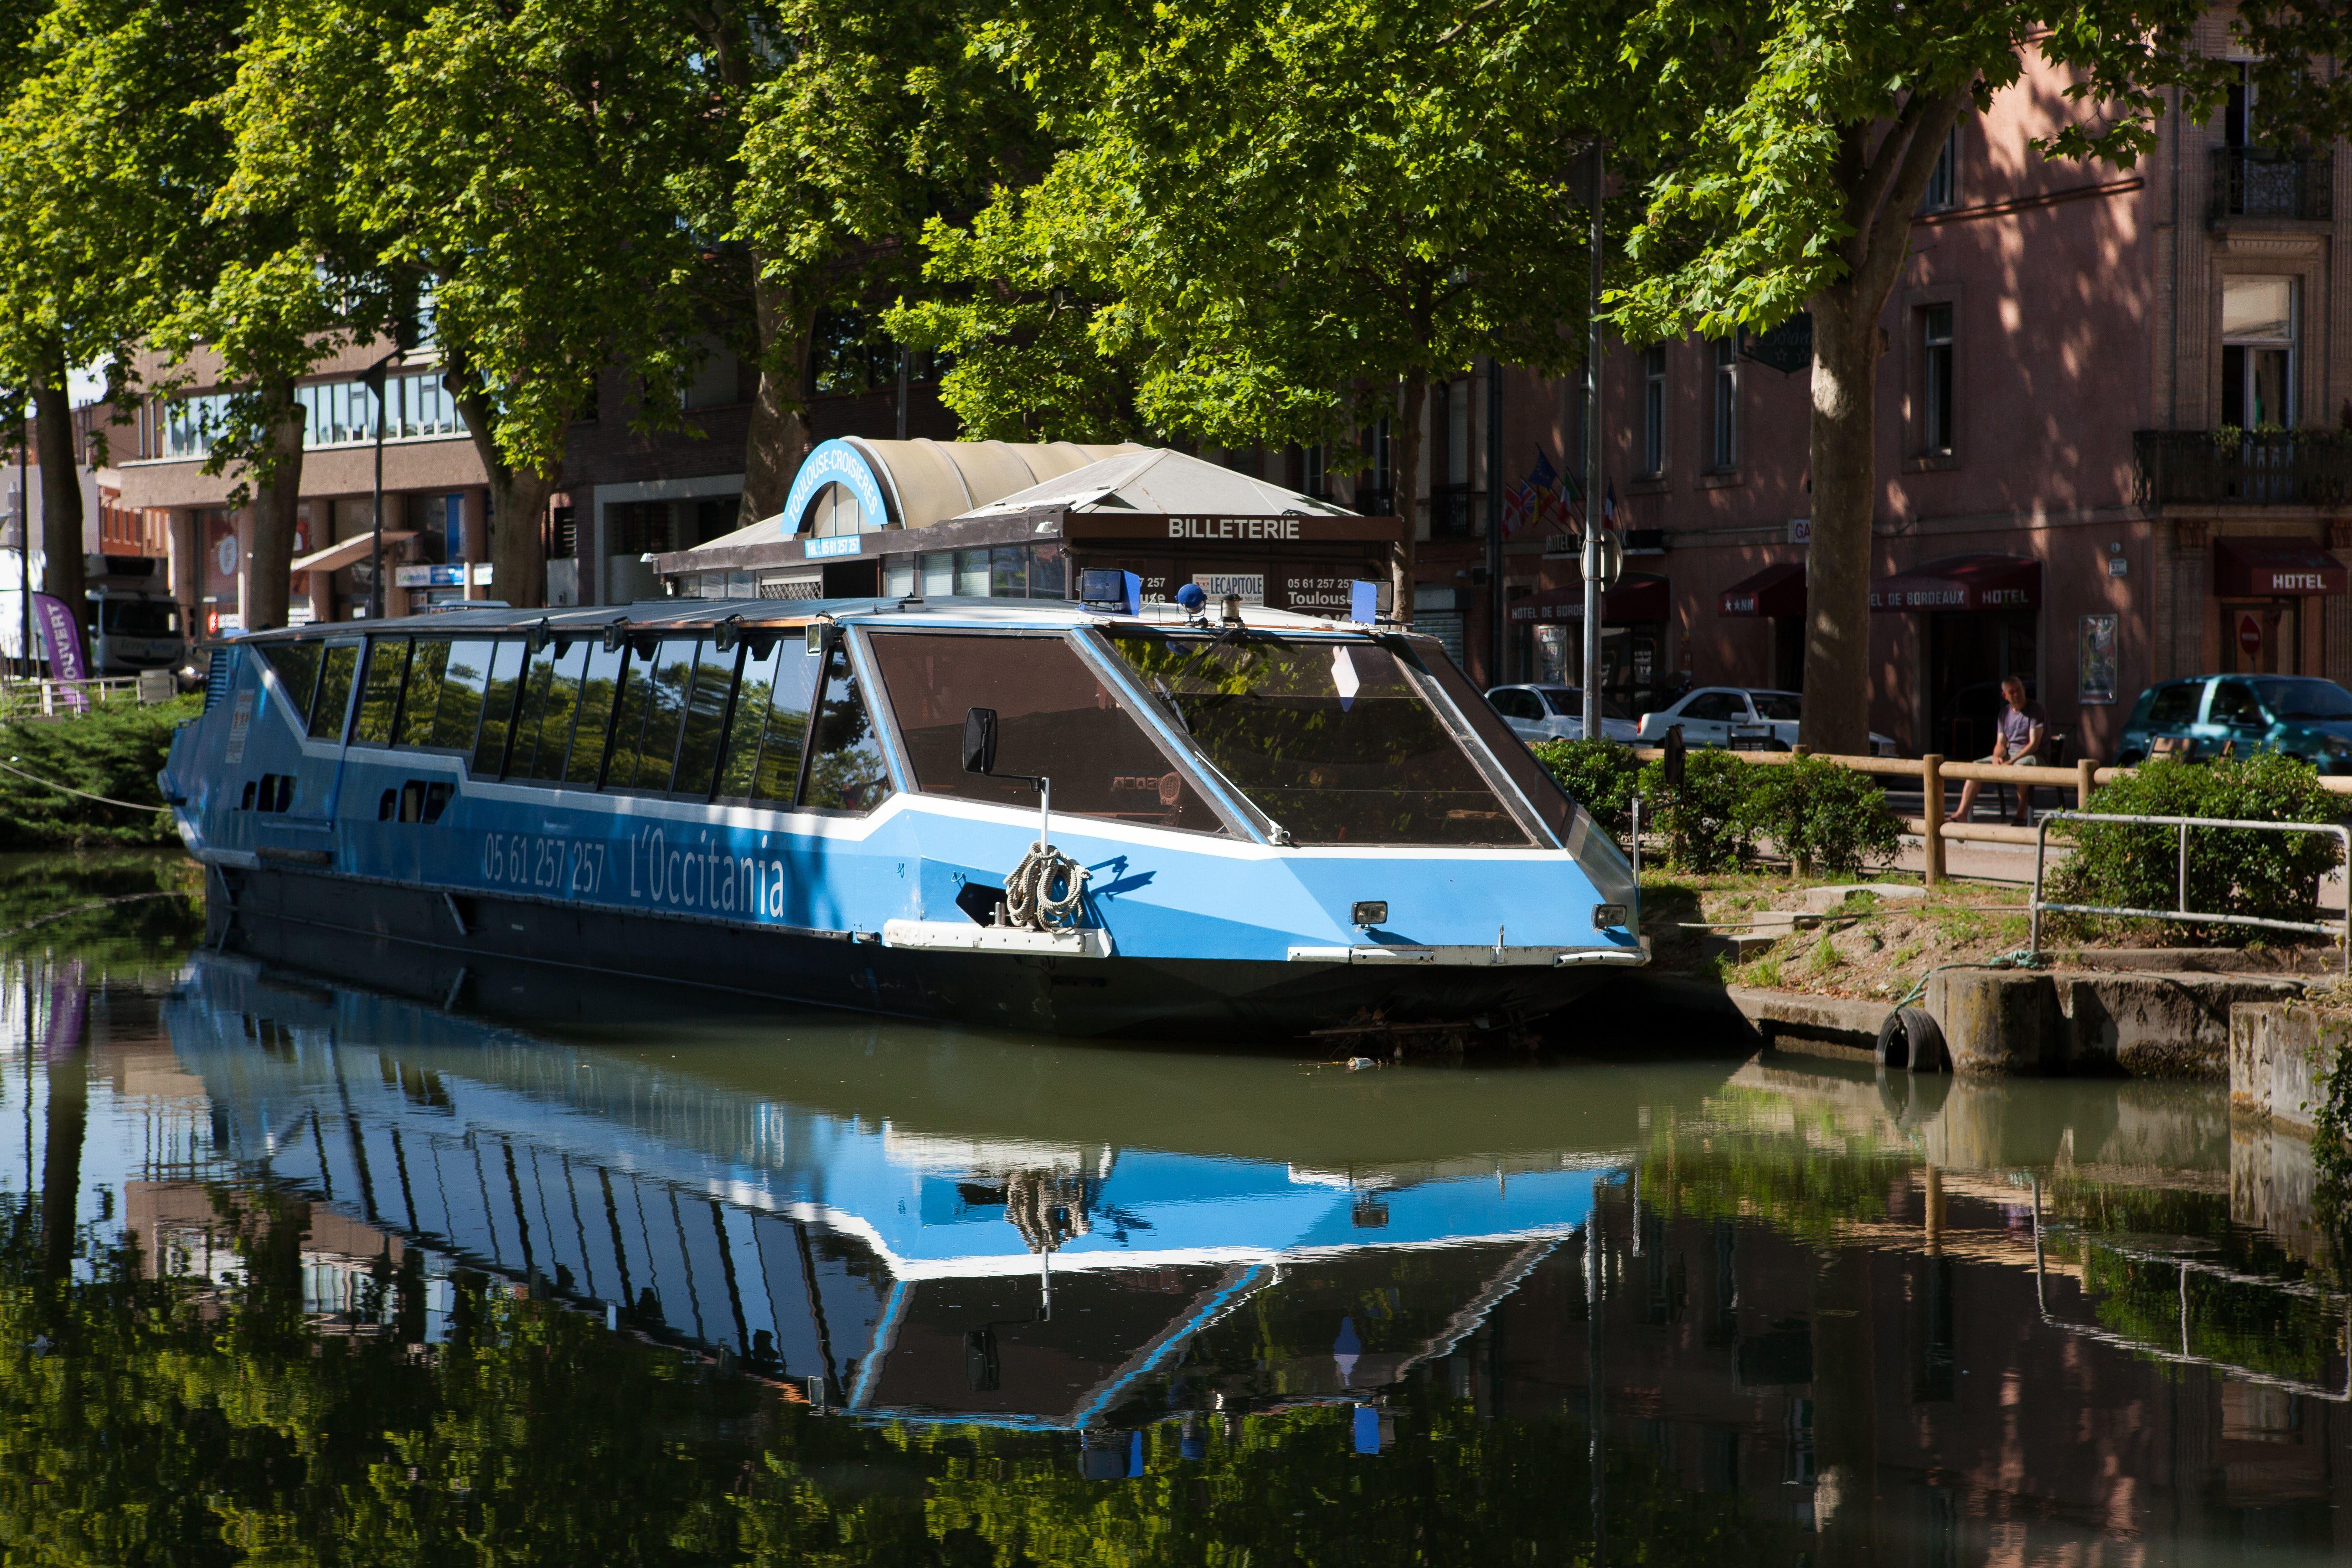 Barco restaurante crucero – El Occitania